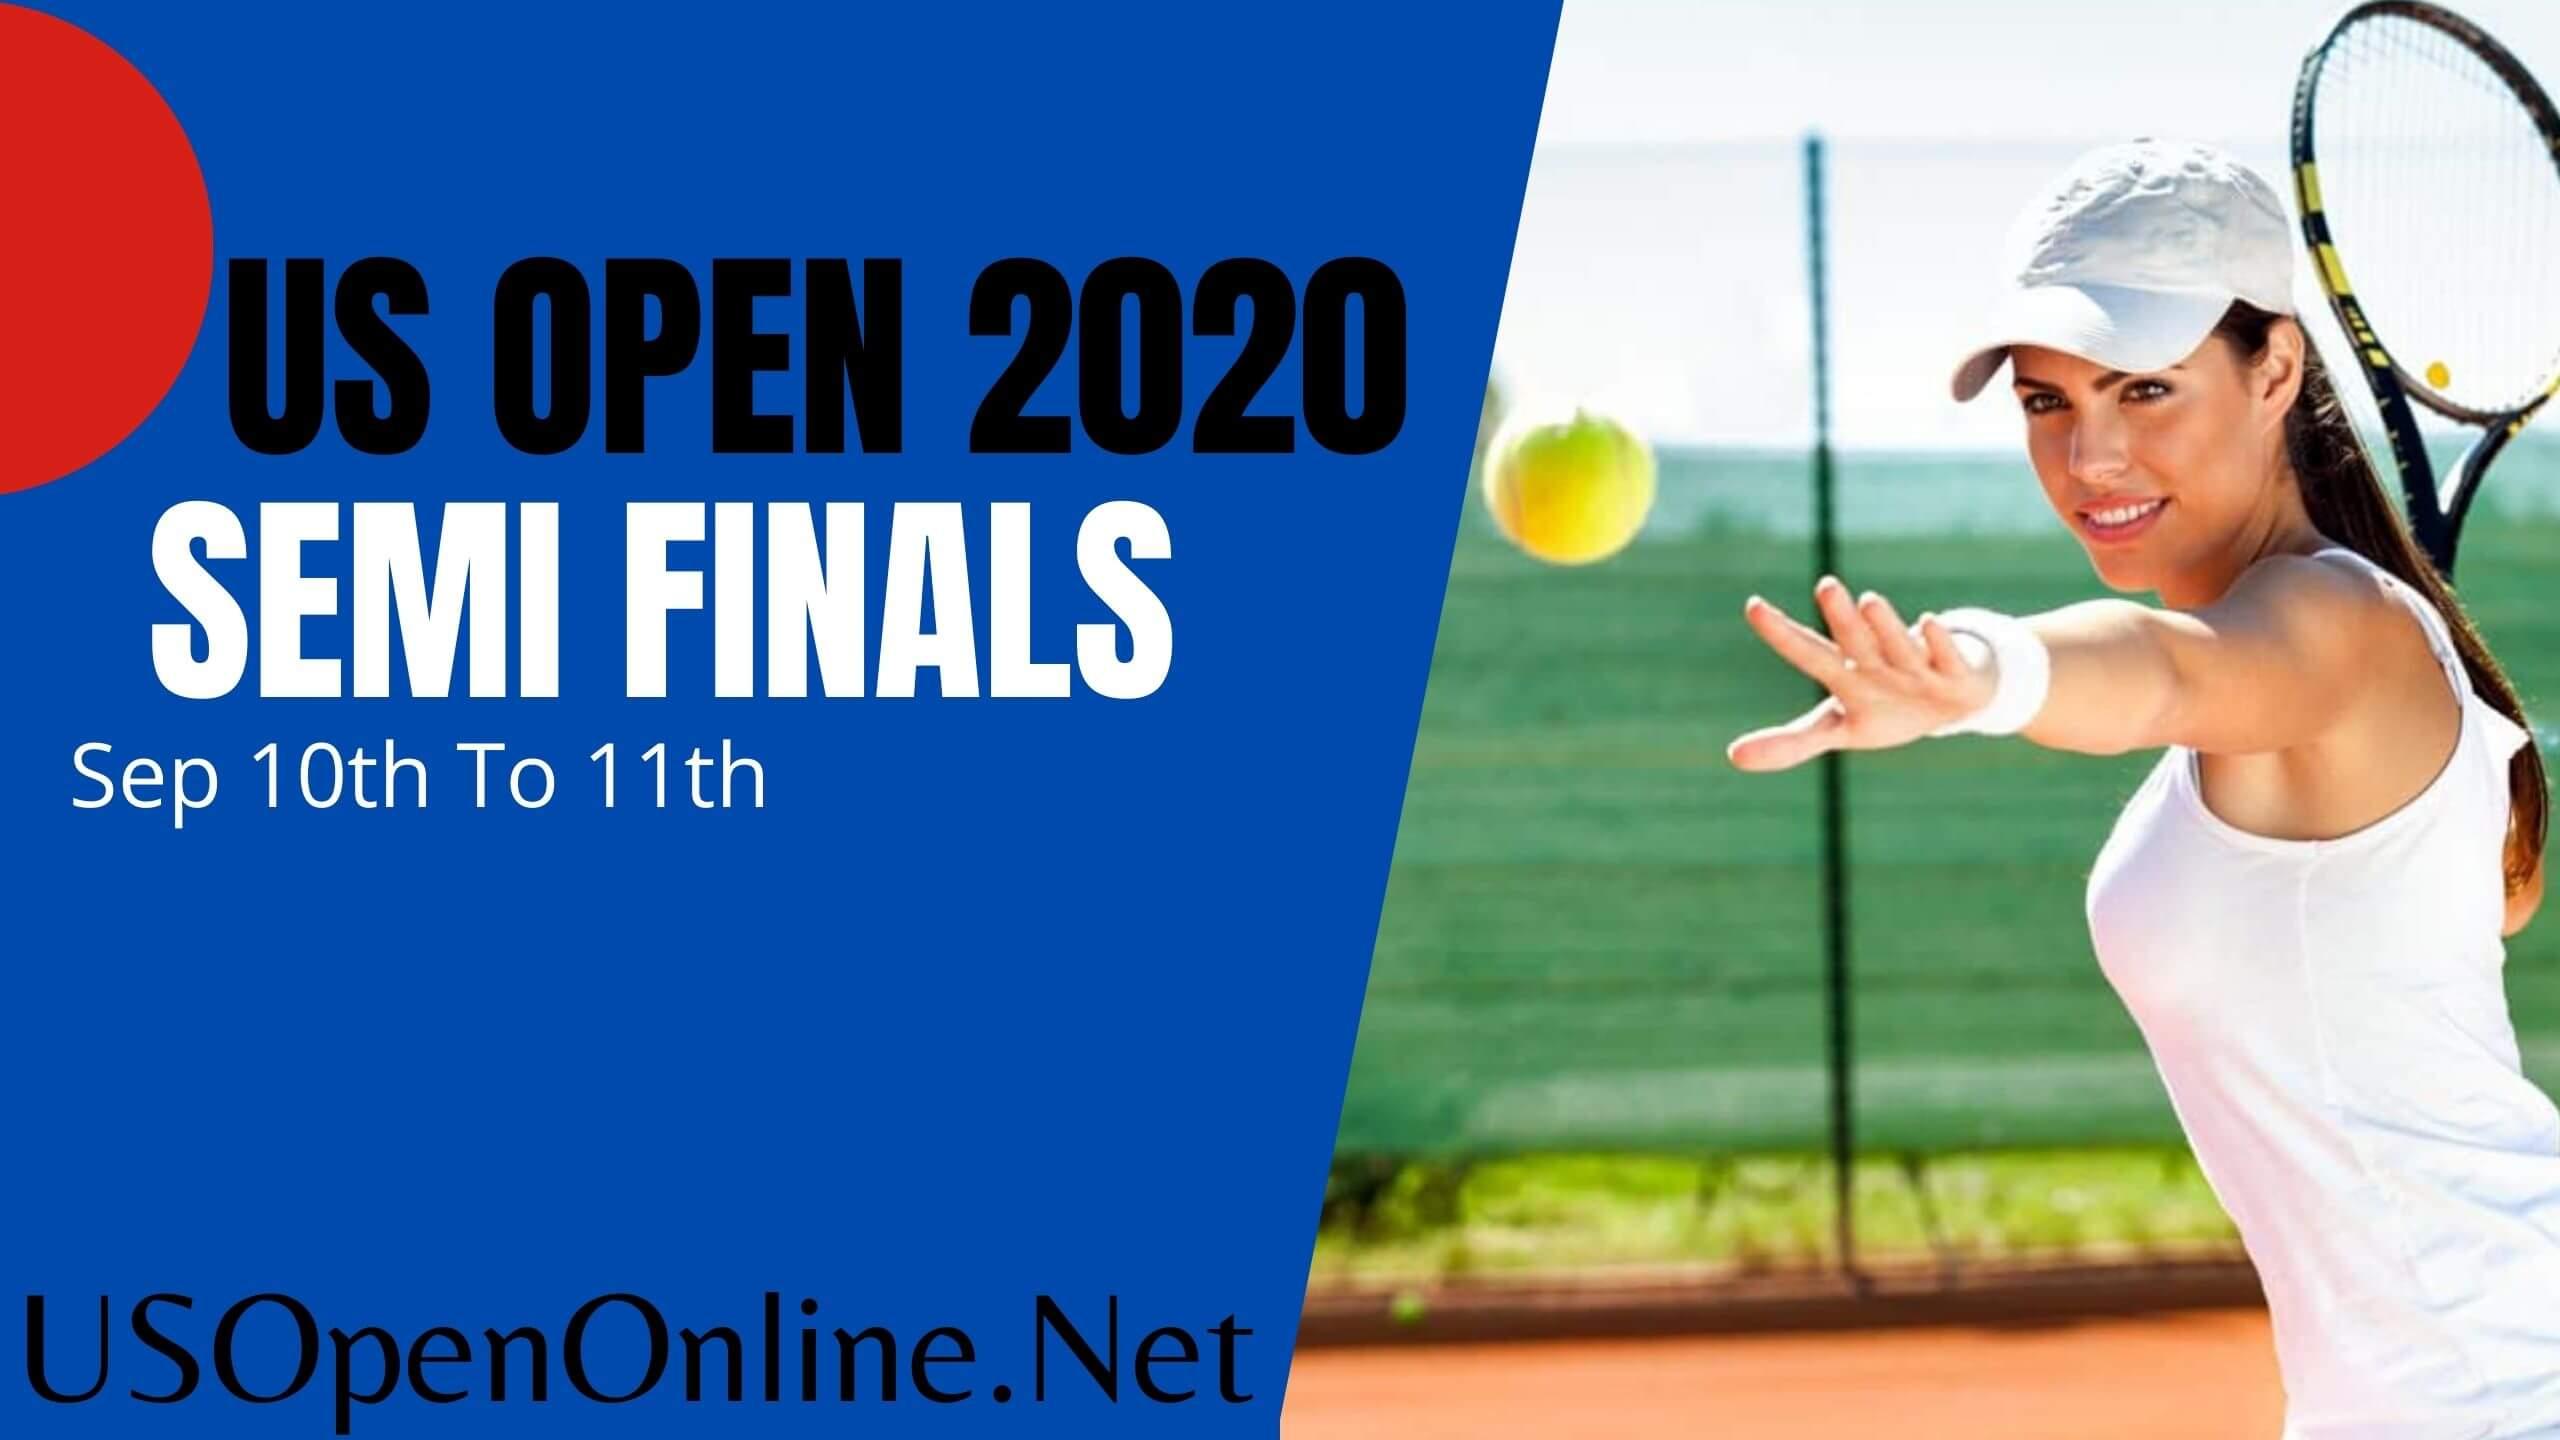 US Open Tennis 2018 Semifinals Live Stream